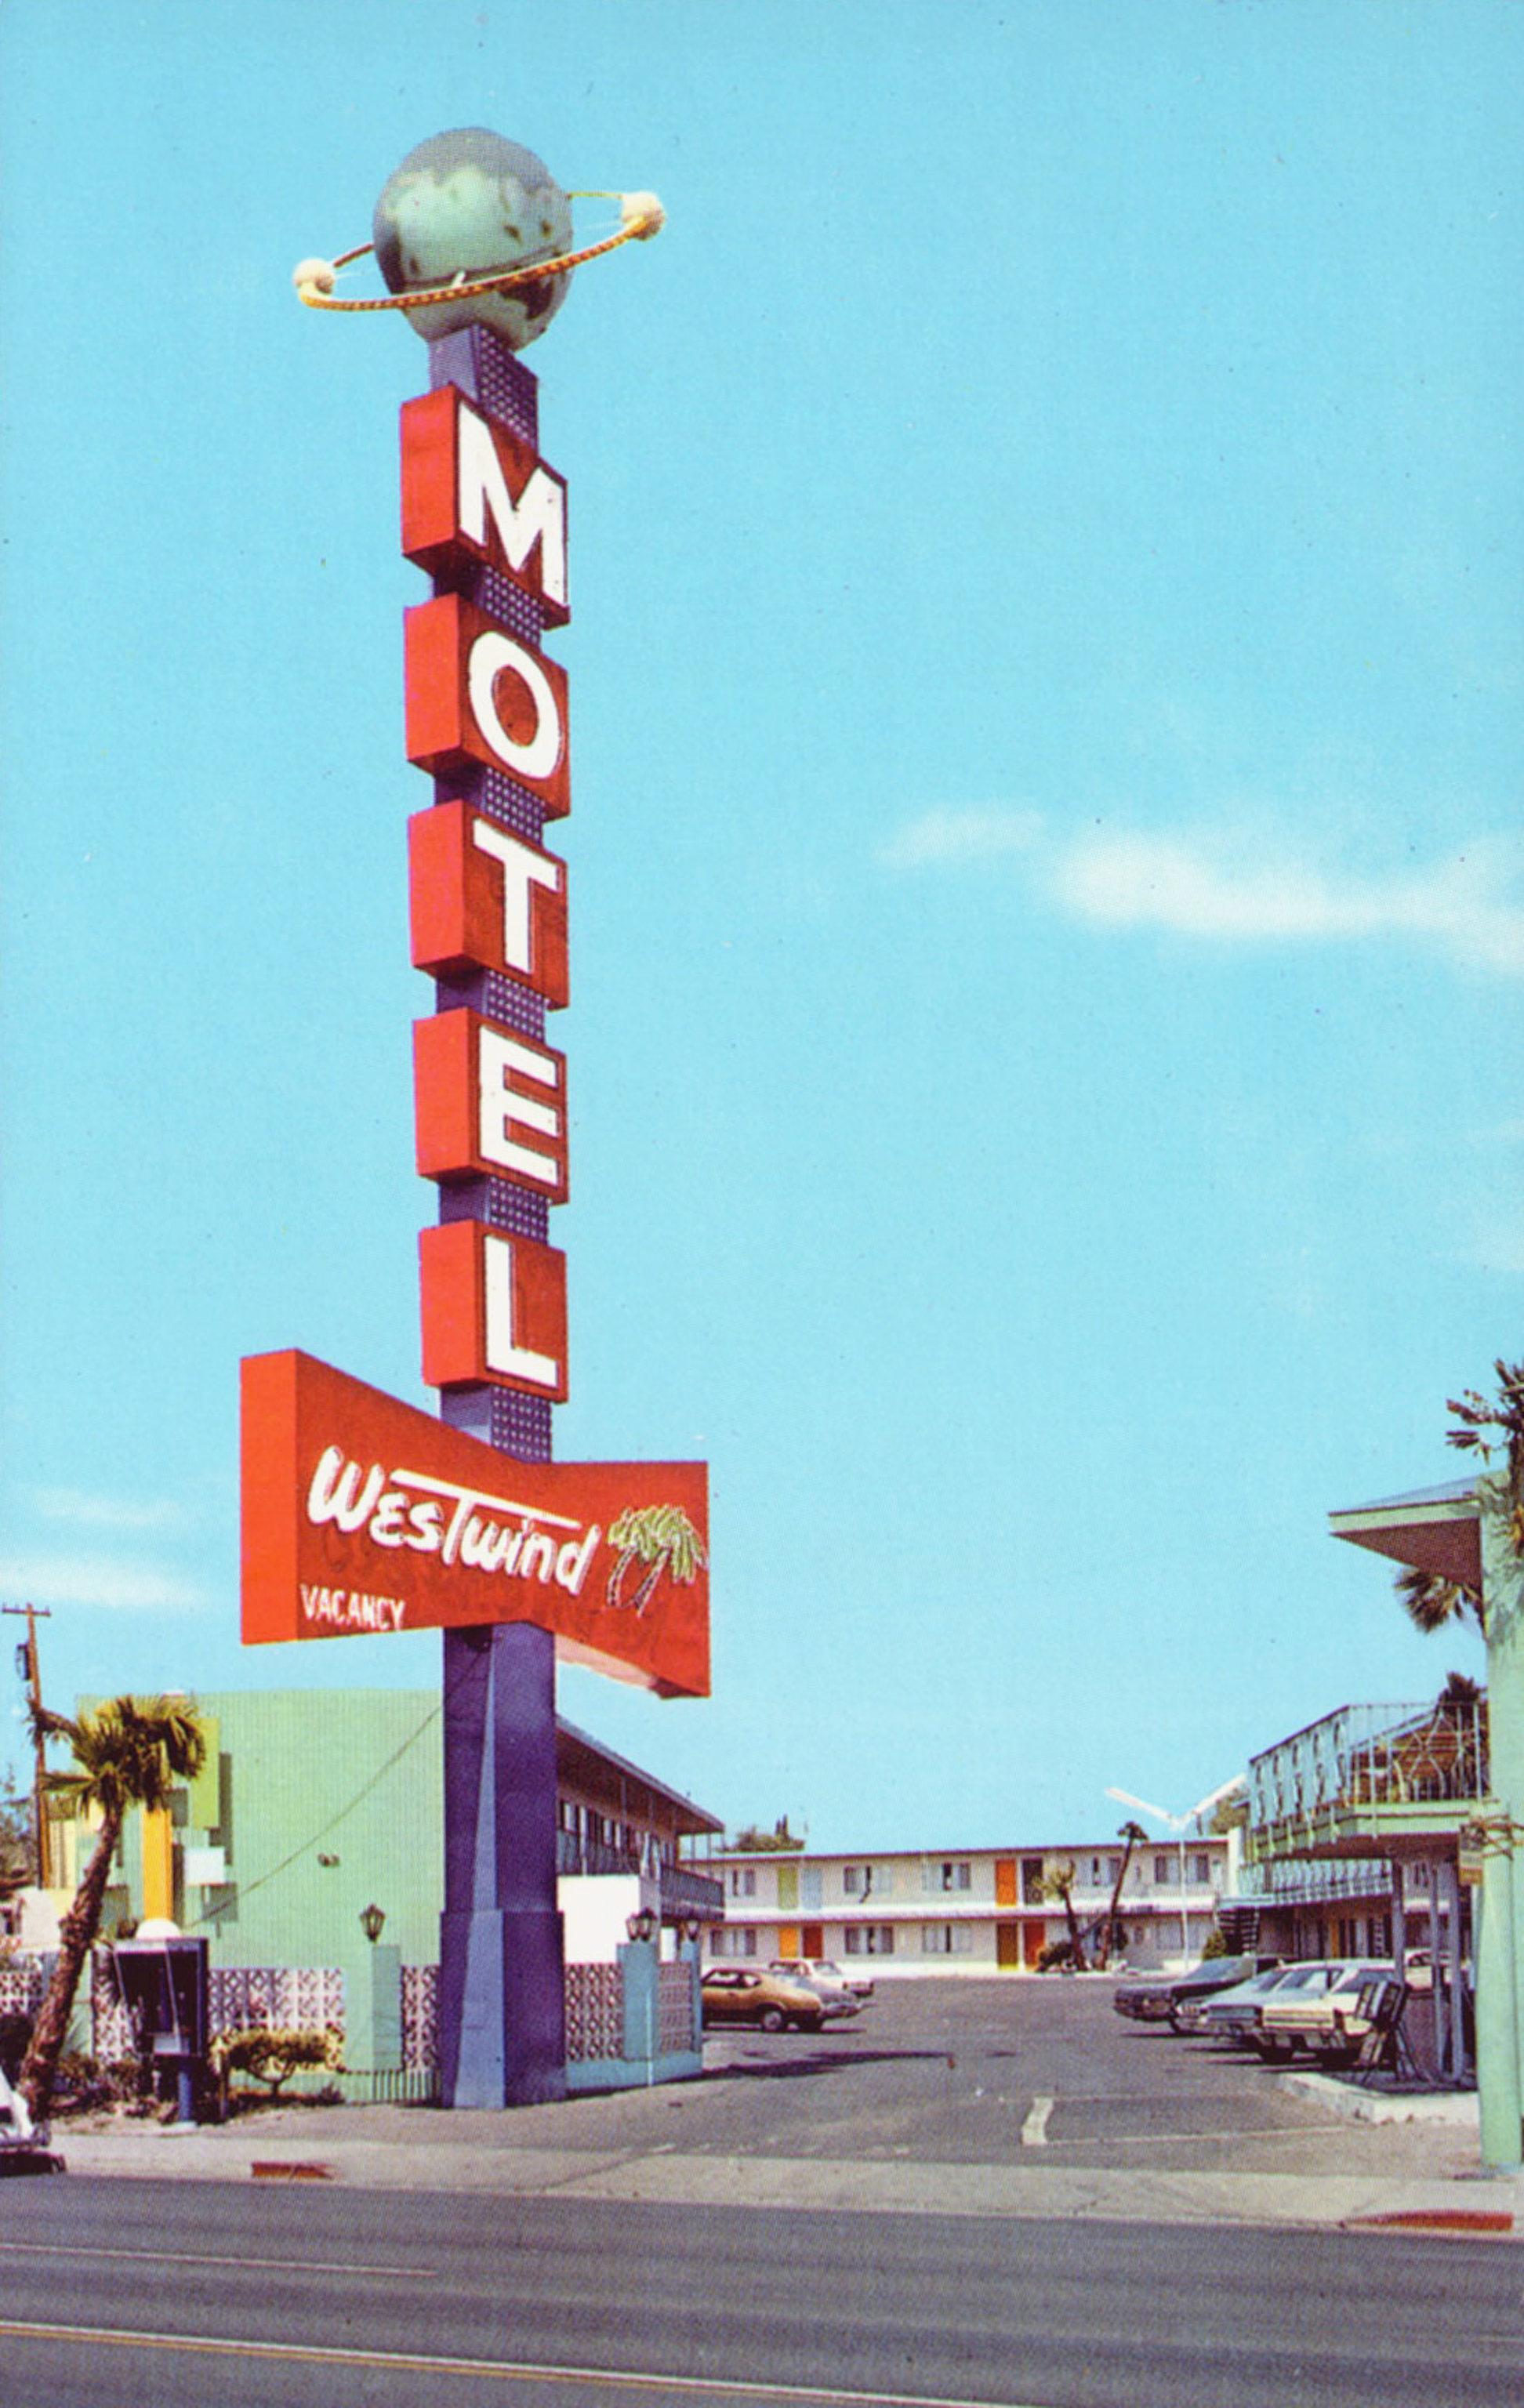 Westwind Motel - 1150 Las Vegas Boulevard South, Las Vegas, Nevada U.S.A. - 1960's